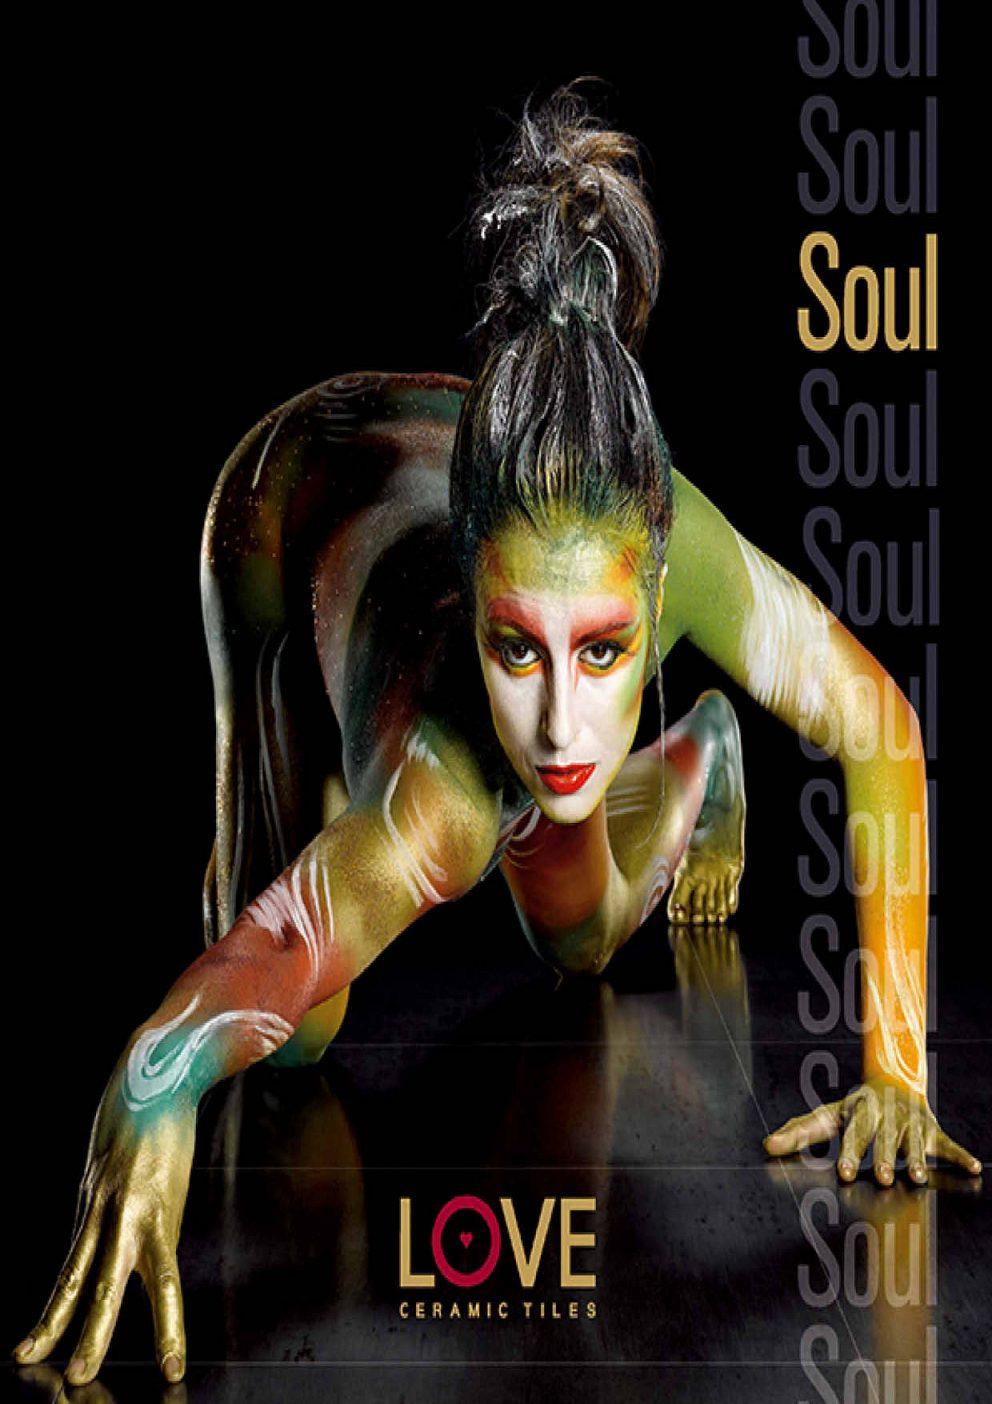 Love - Soul